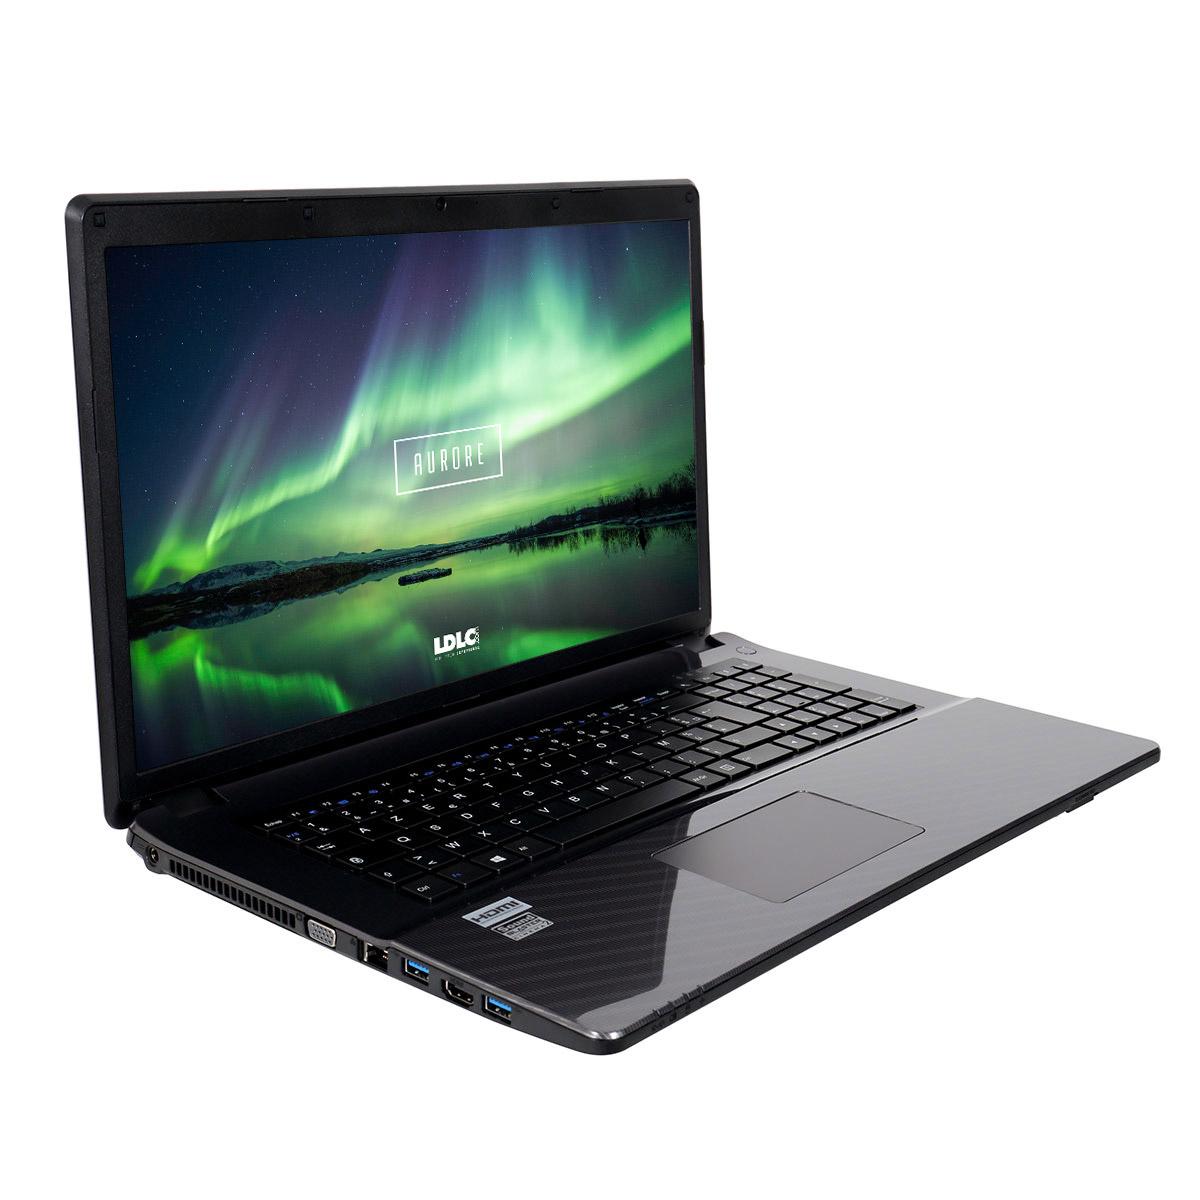 "PC portable LDLC Aurore Ci3-4-H20 Intel Core i3-6100H 4 Go 2 To 17.3"" LED HD+ Graveur DVD Wi-Fi N/Bluetooth Webcam (sans OS)"